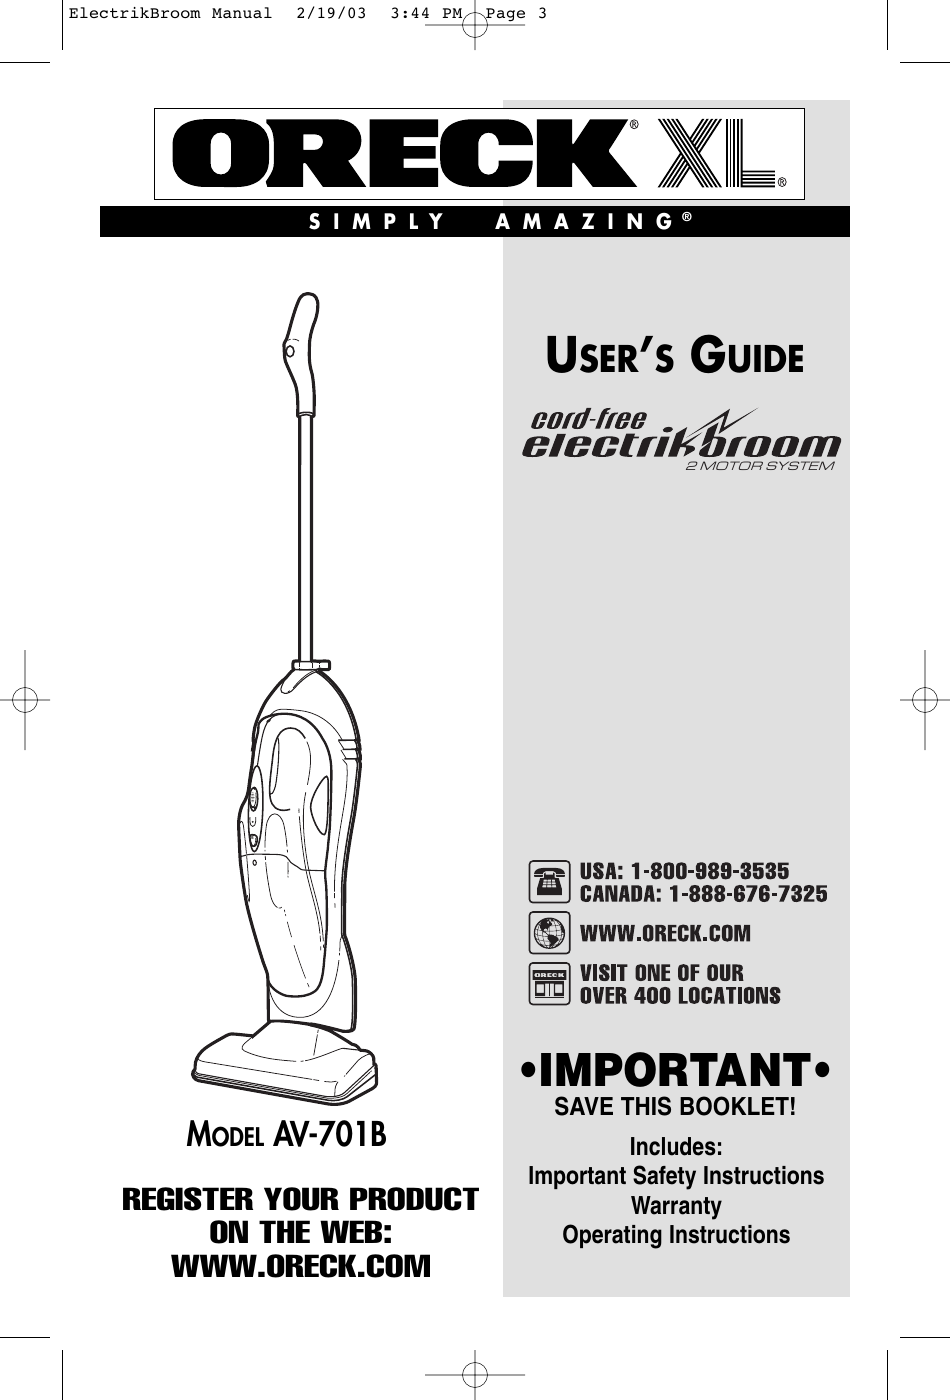 Oreck Av 701b Users Manual Electrikbroom Hand Vacuum Wiring Diagram